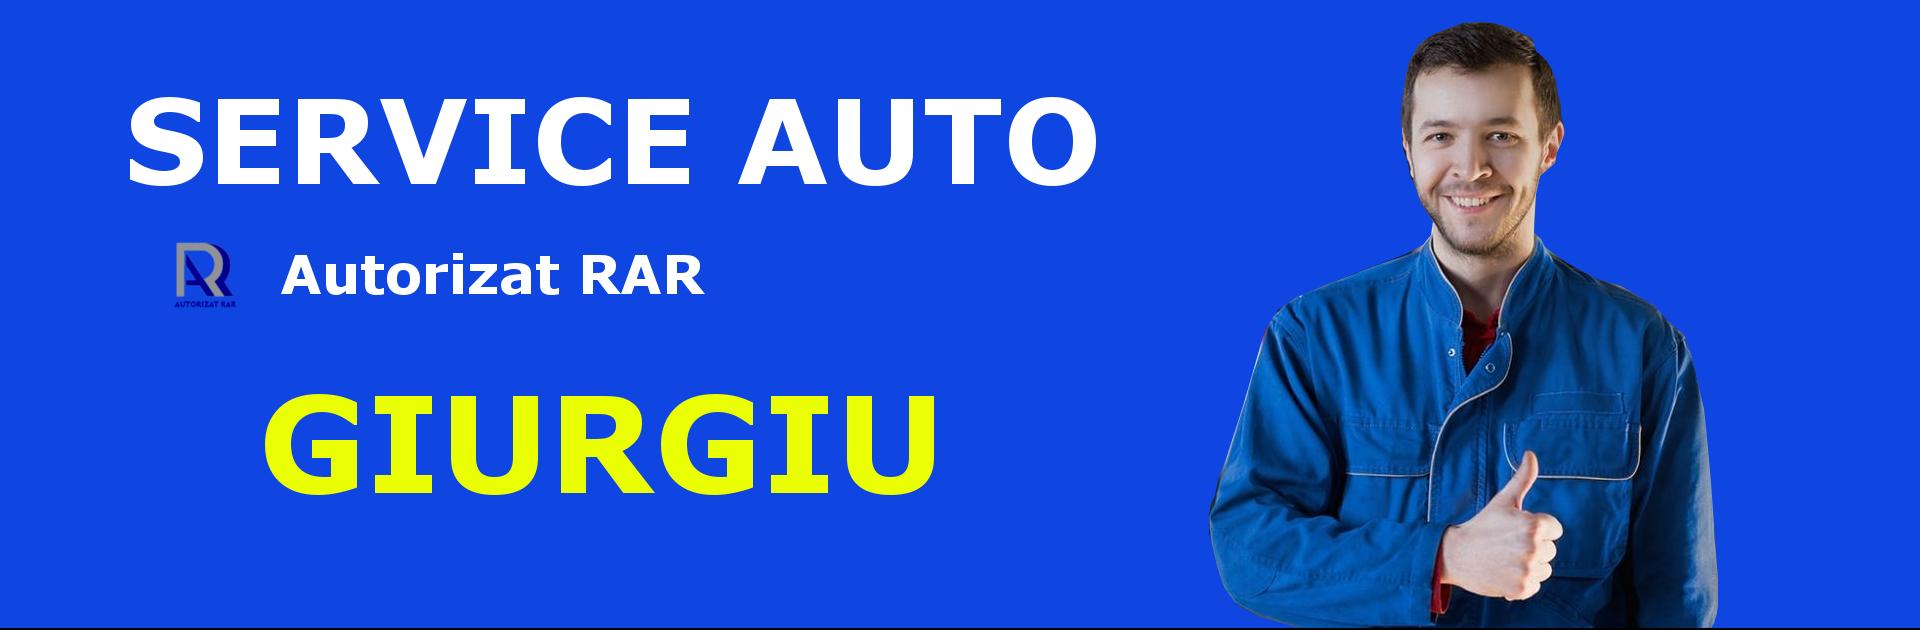 Banner service GIURGIU